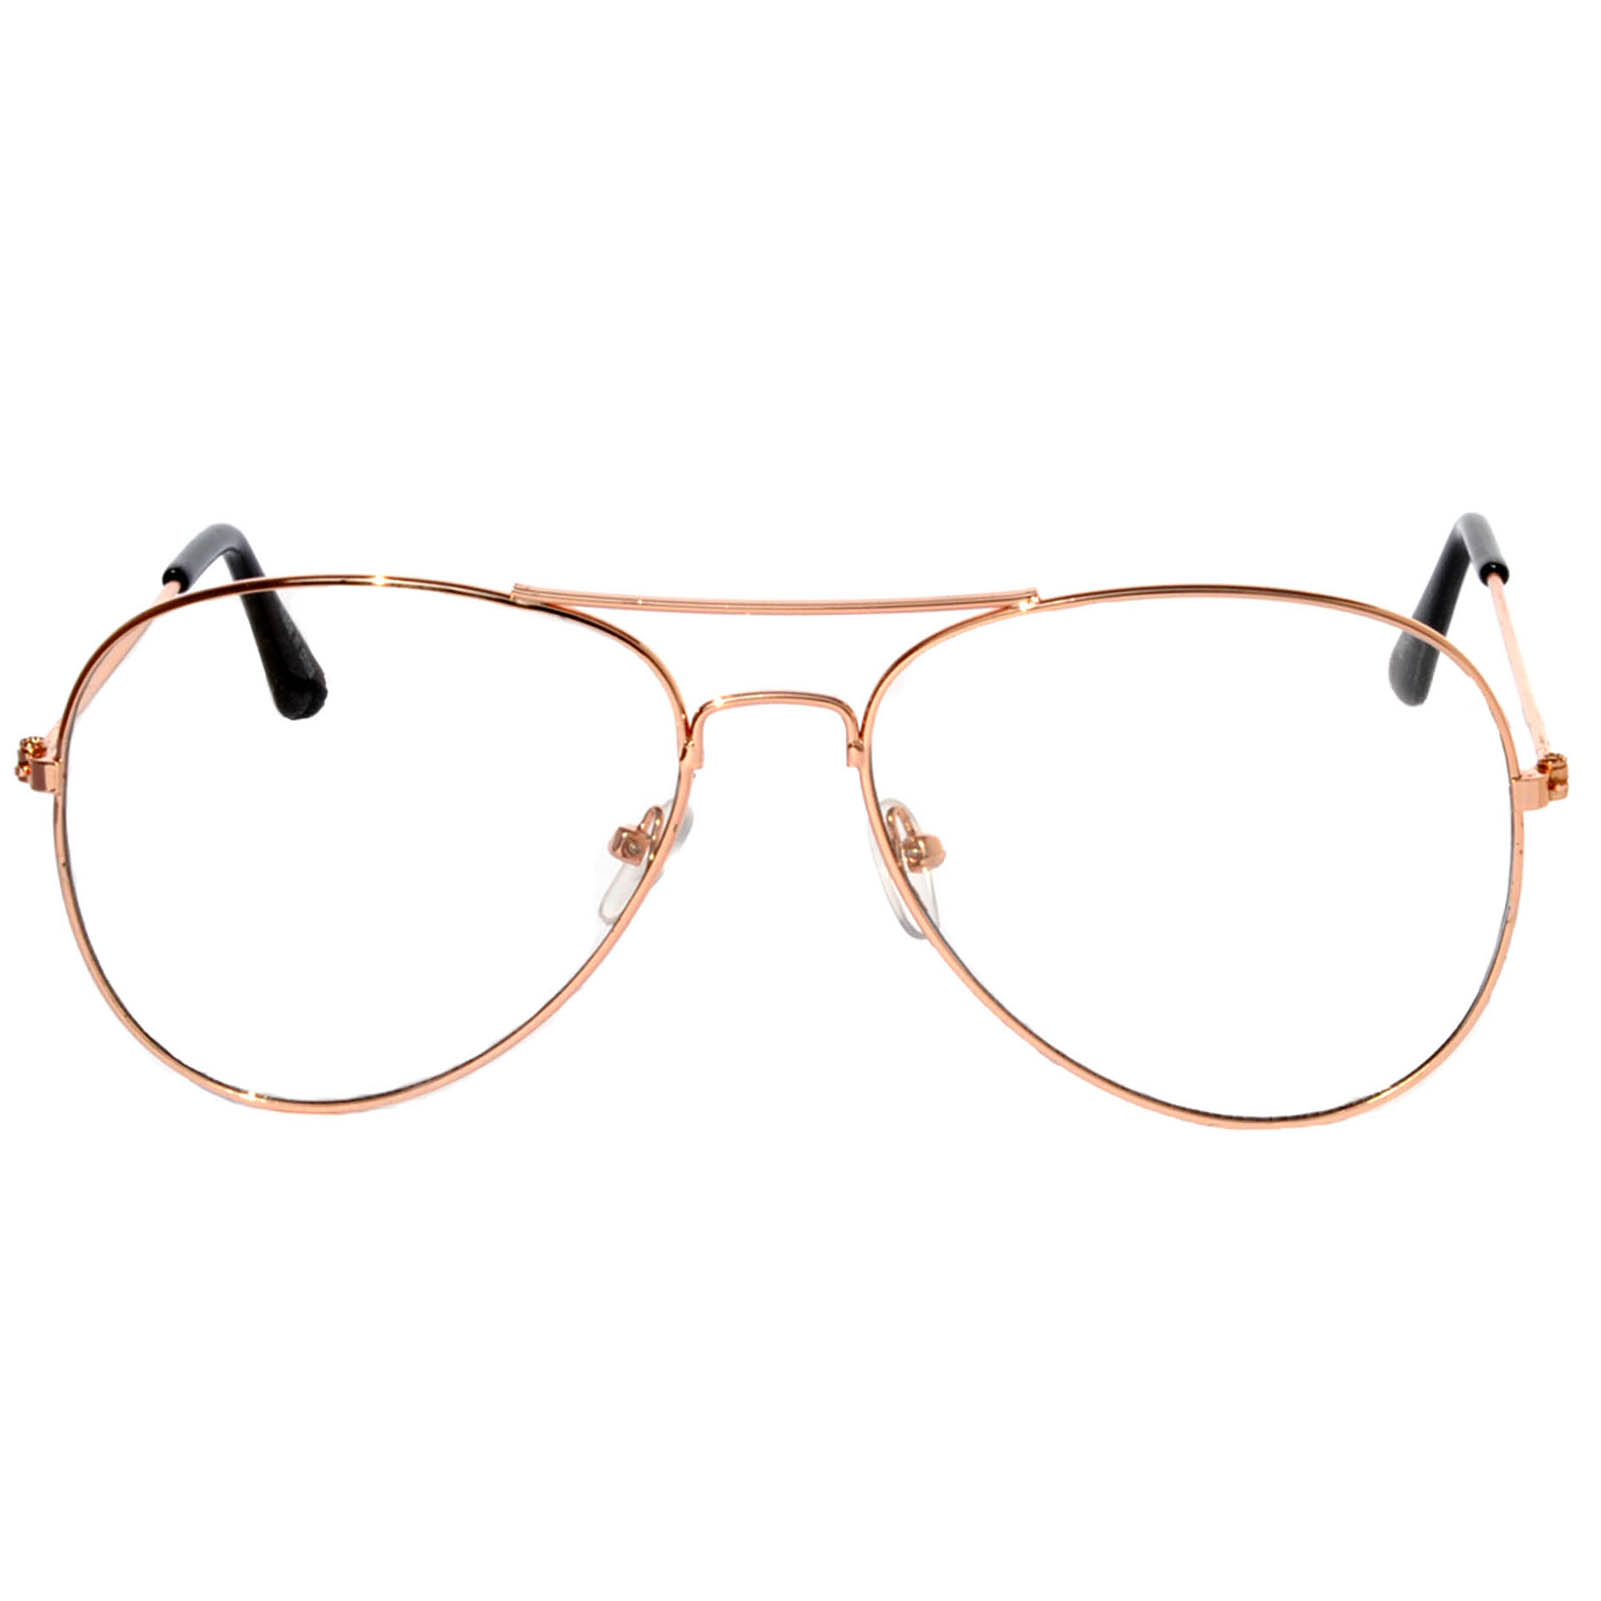 e5c79563c0f OWL ® Eyewear Sunglasses Metal Fashion Aviator Gold Frame Clear Lens ...